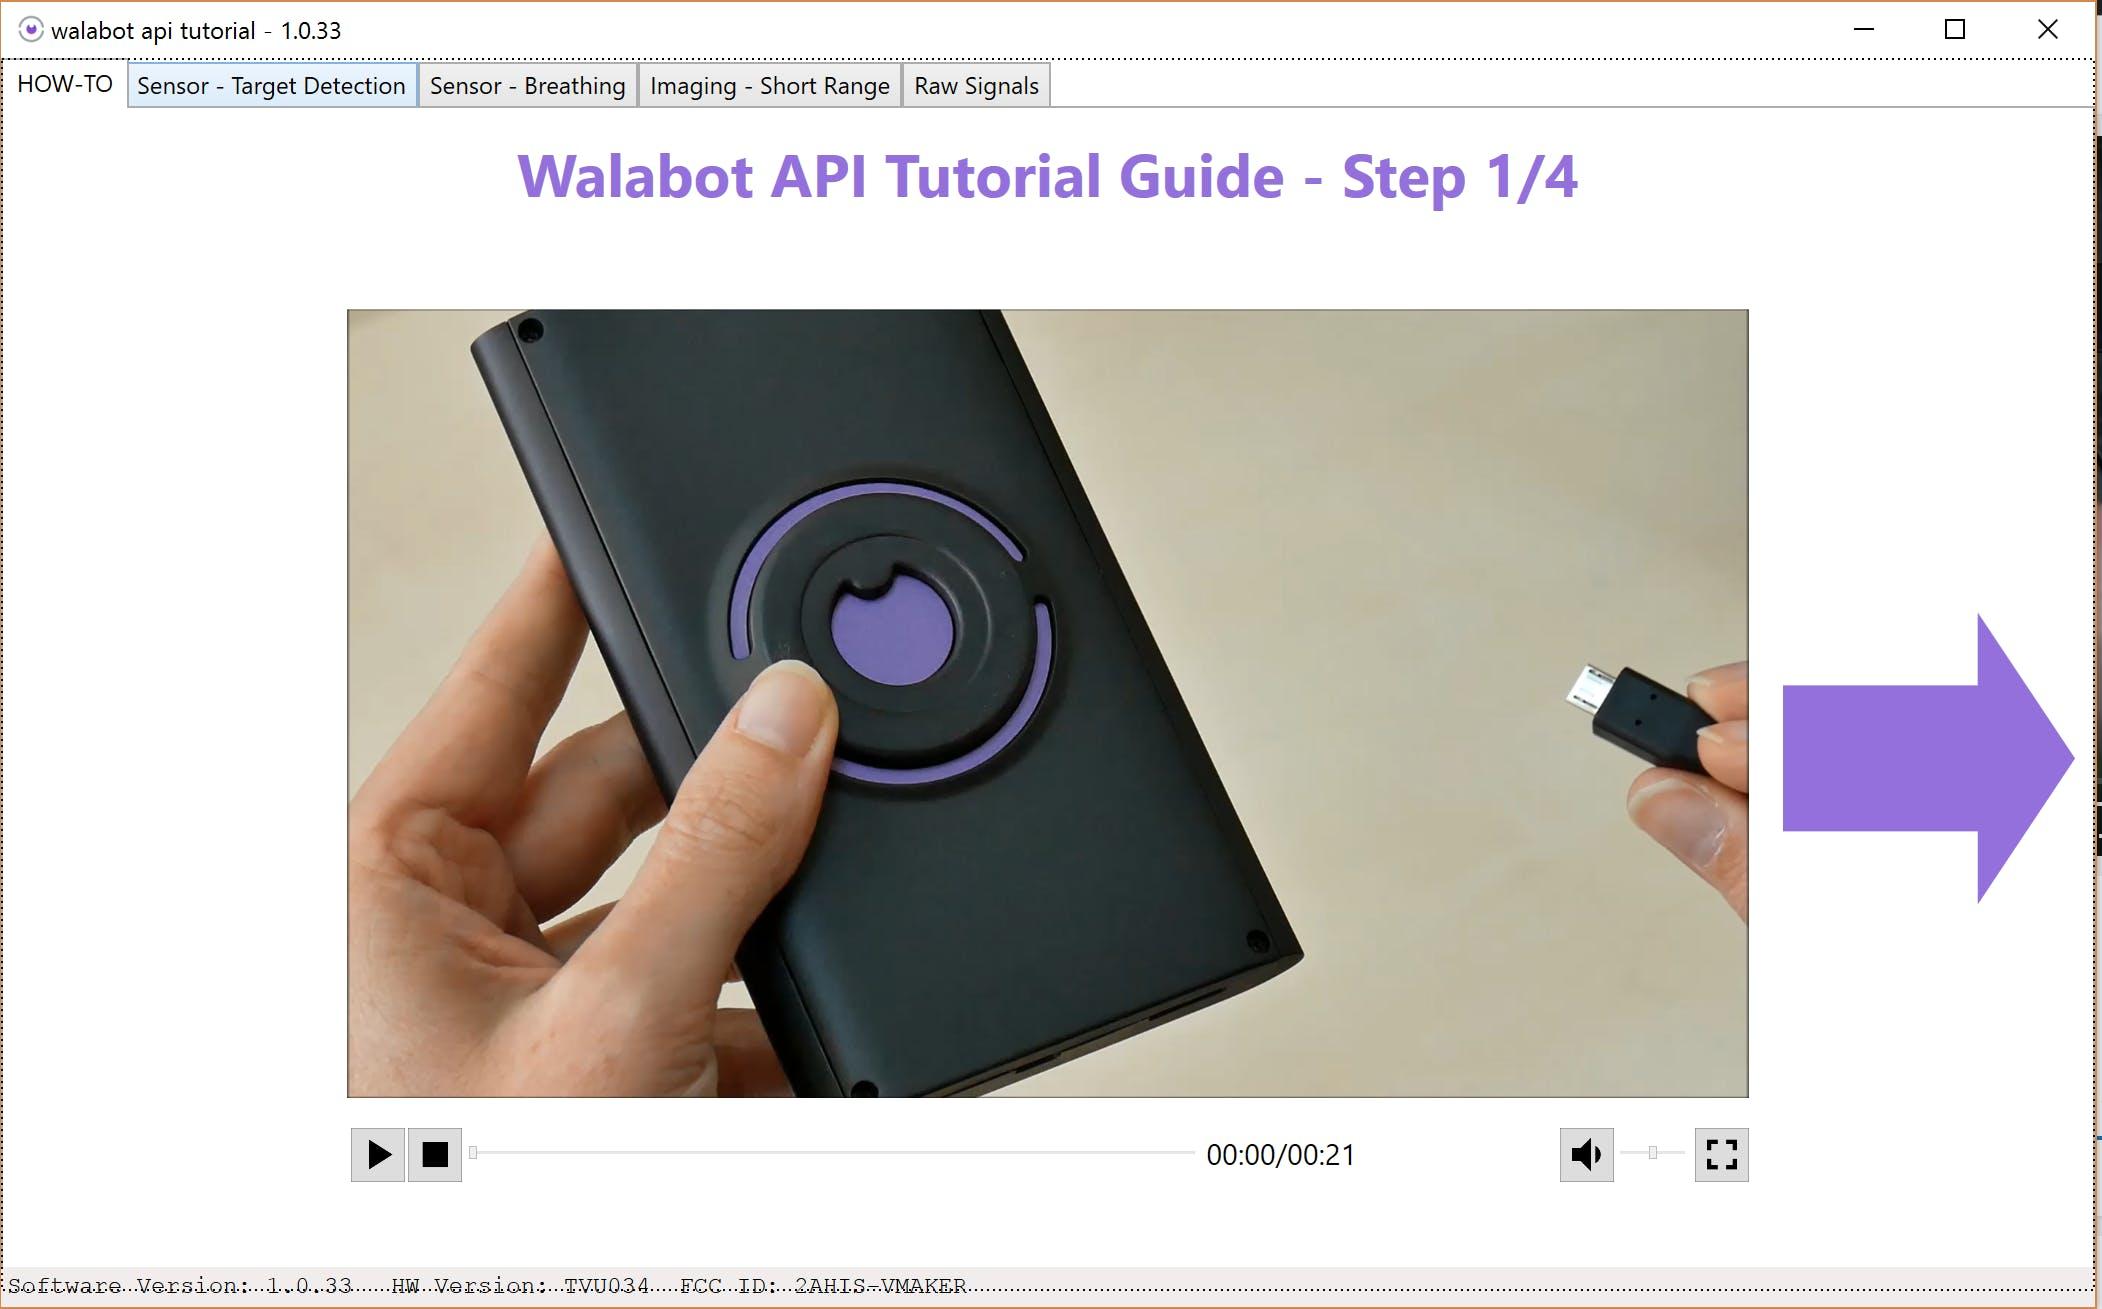 Walabot API Tutorial